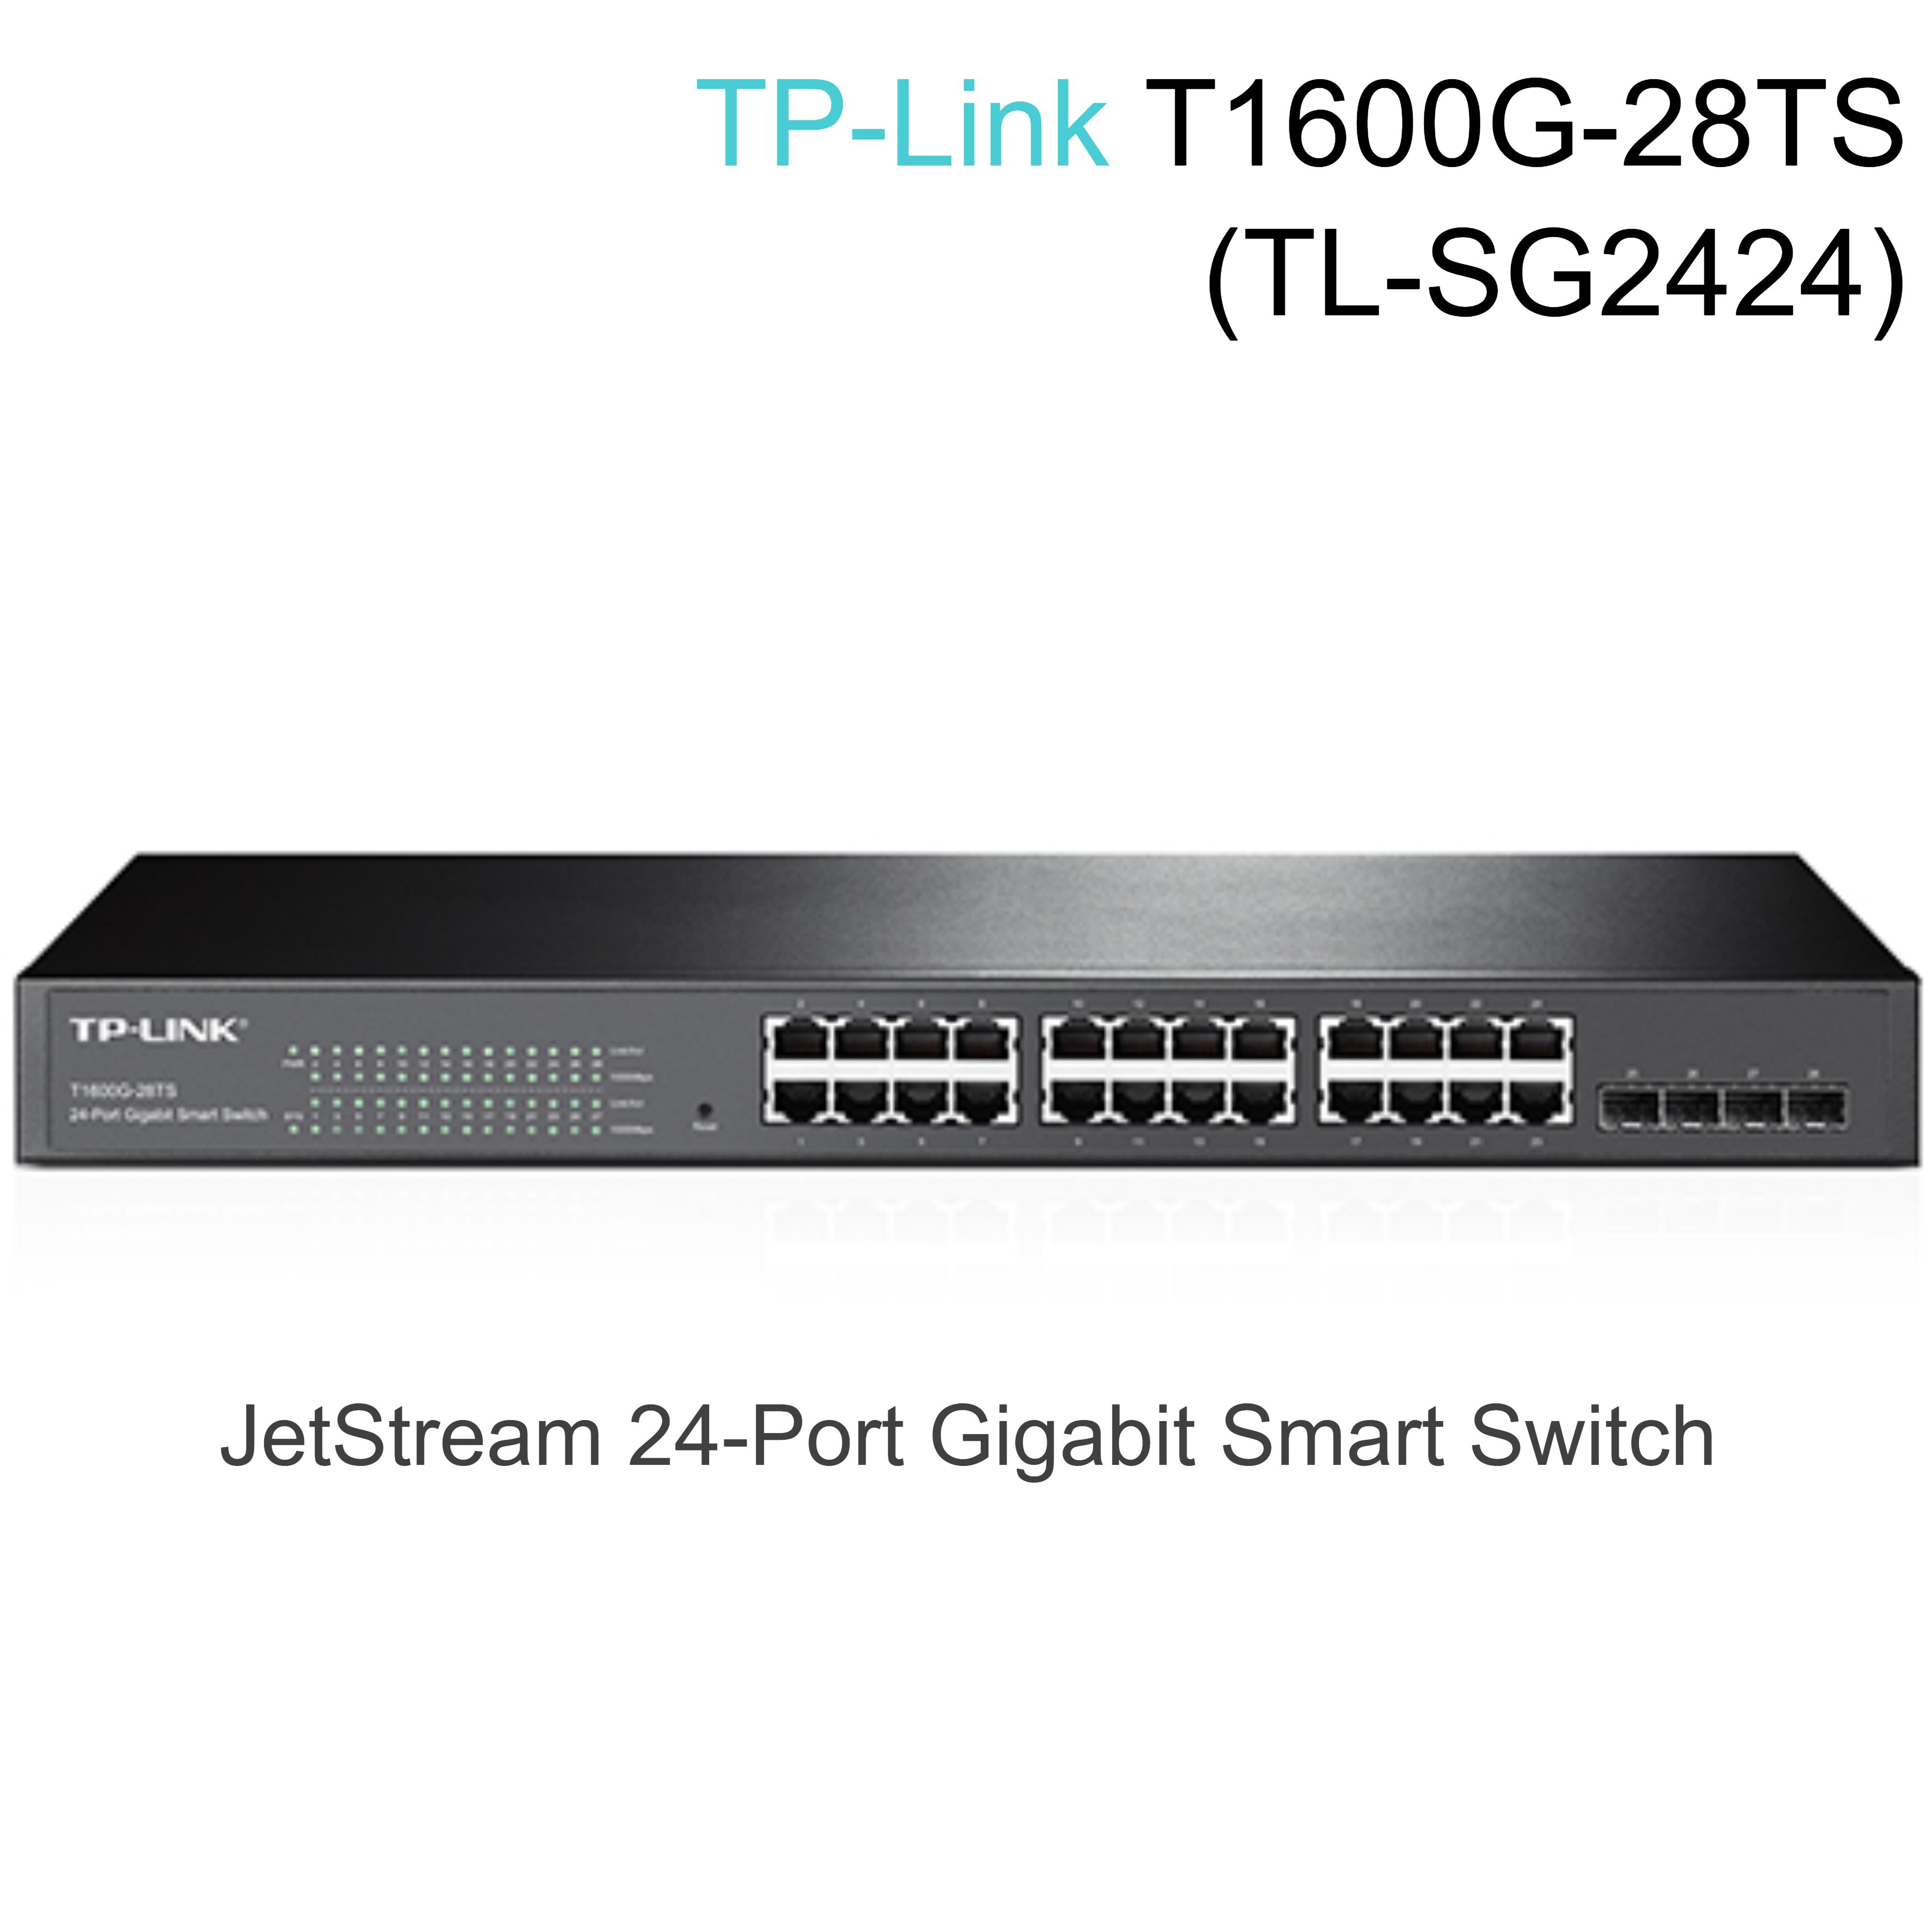 TP-Link T1600G-28TS|JetStream 24-Port Gibit Smart Switch + 4 SFP Slots|TL-SG2424